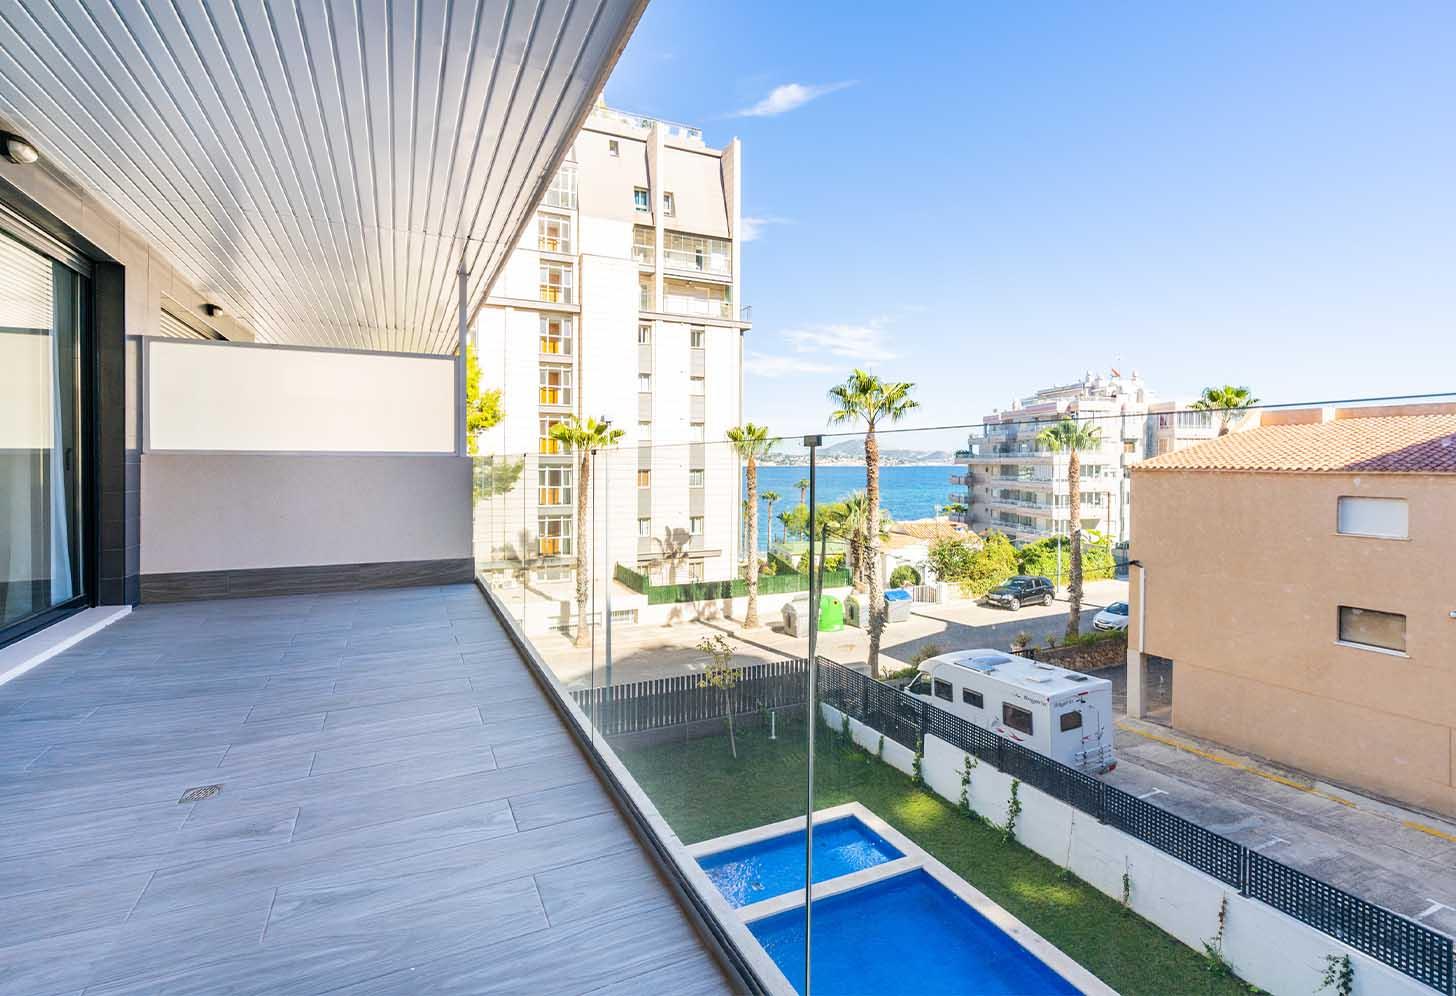 immobilier neuf espagne costa blanca on-m1 calpe beach II terrasse 2